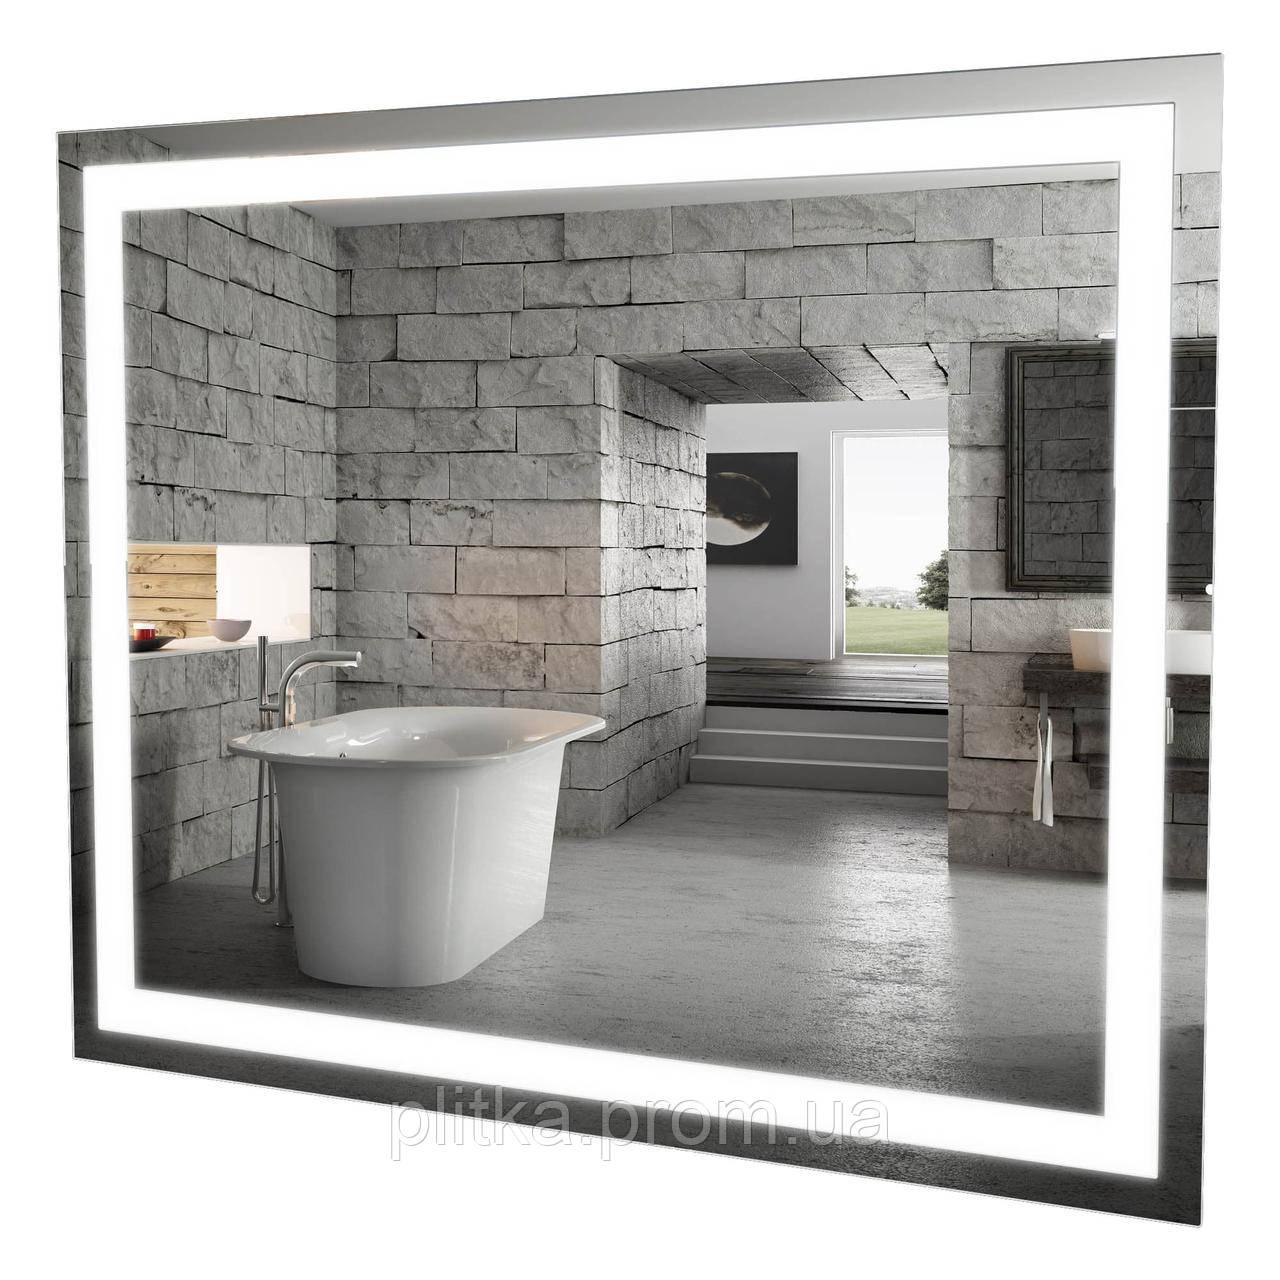 Зеркало Альфа 100 см с LED подсветкой